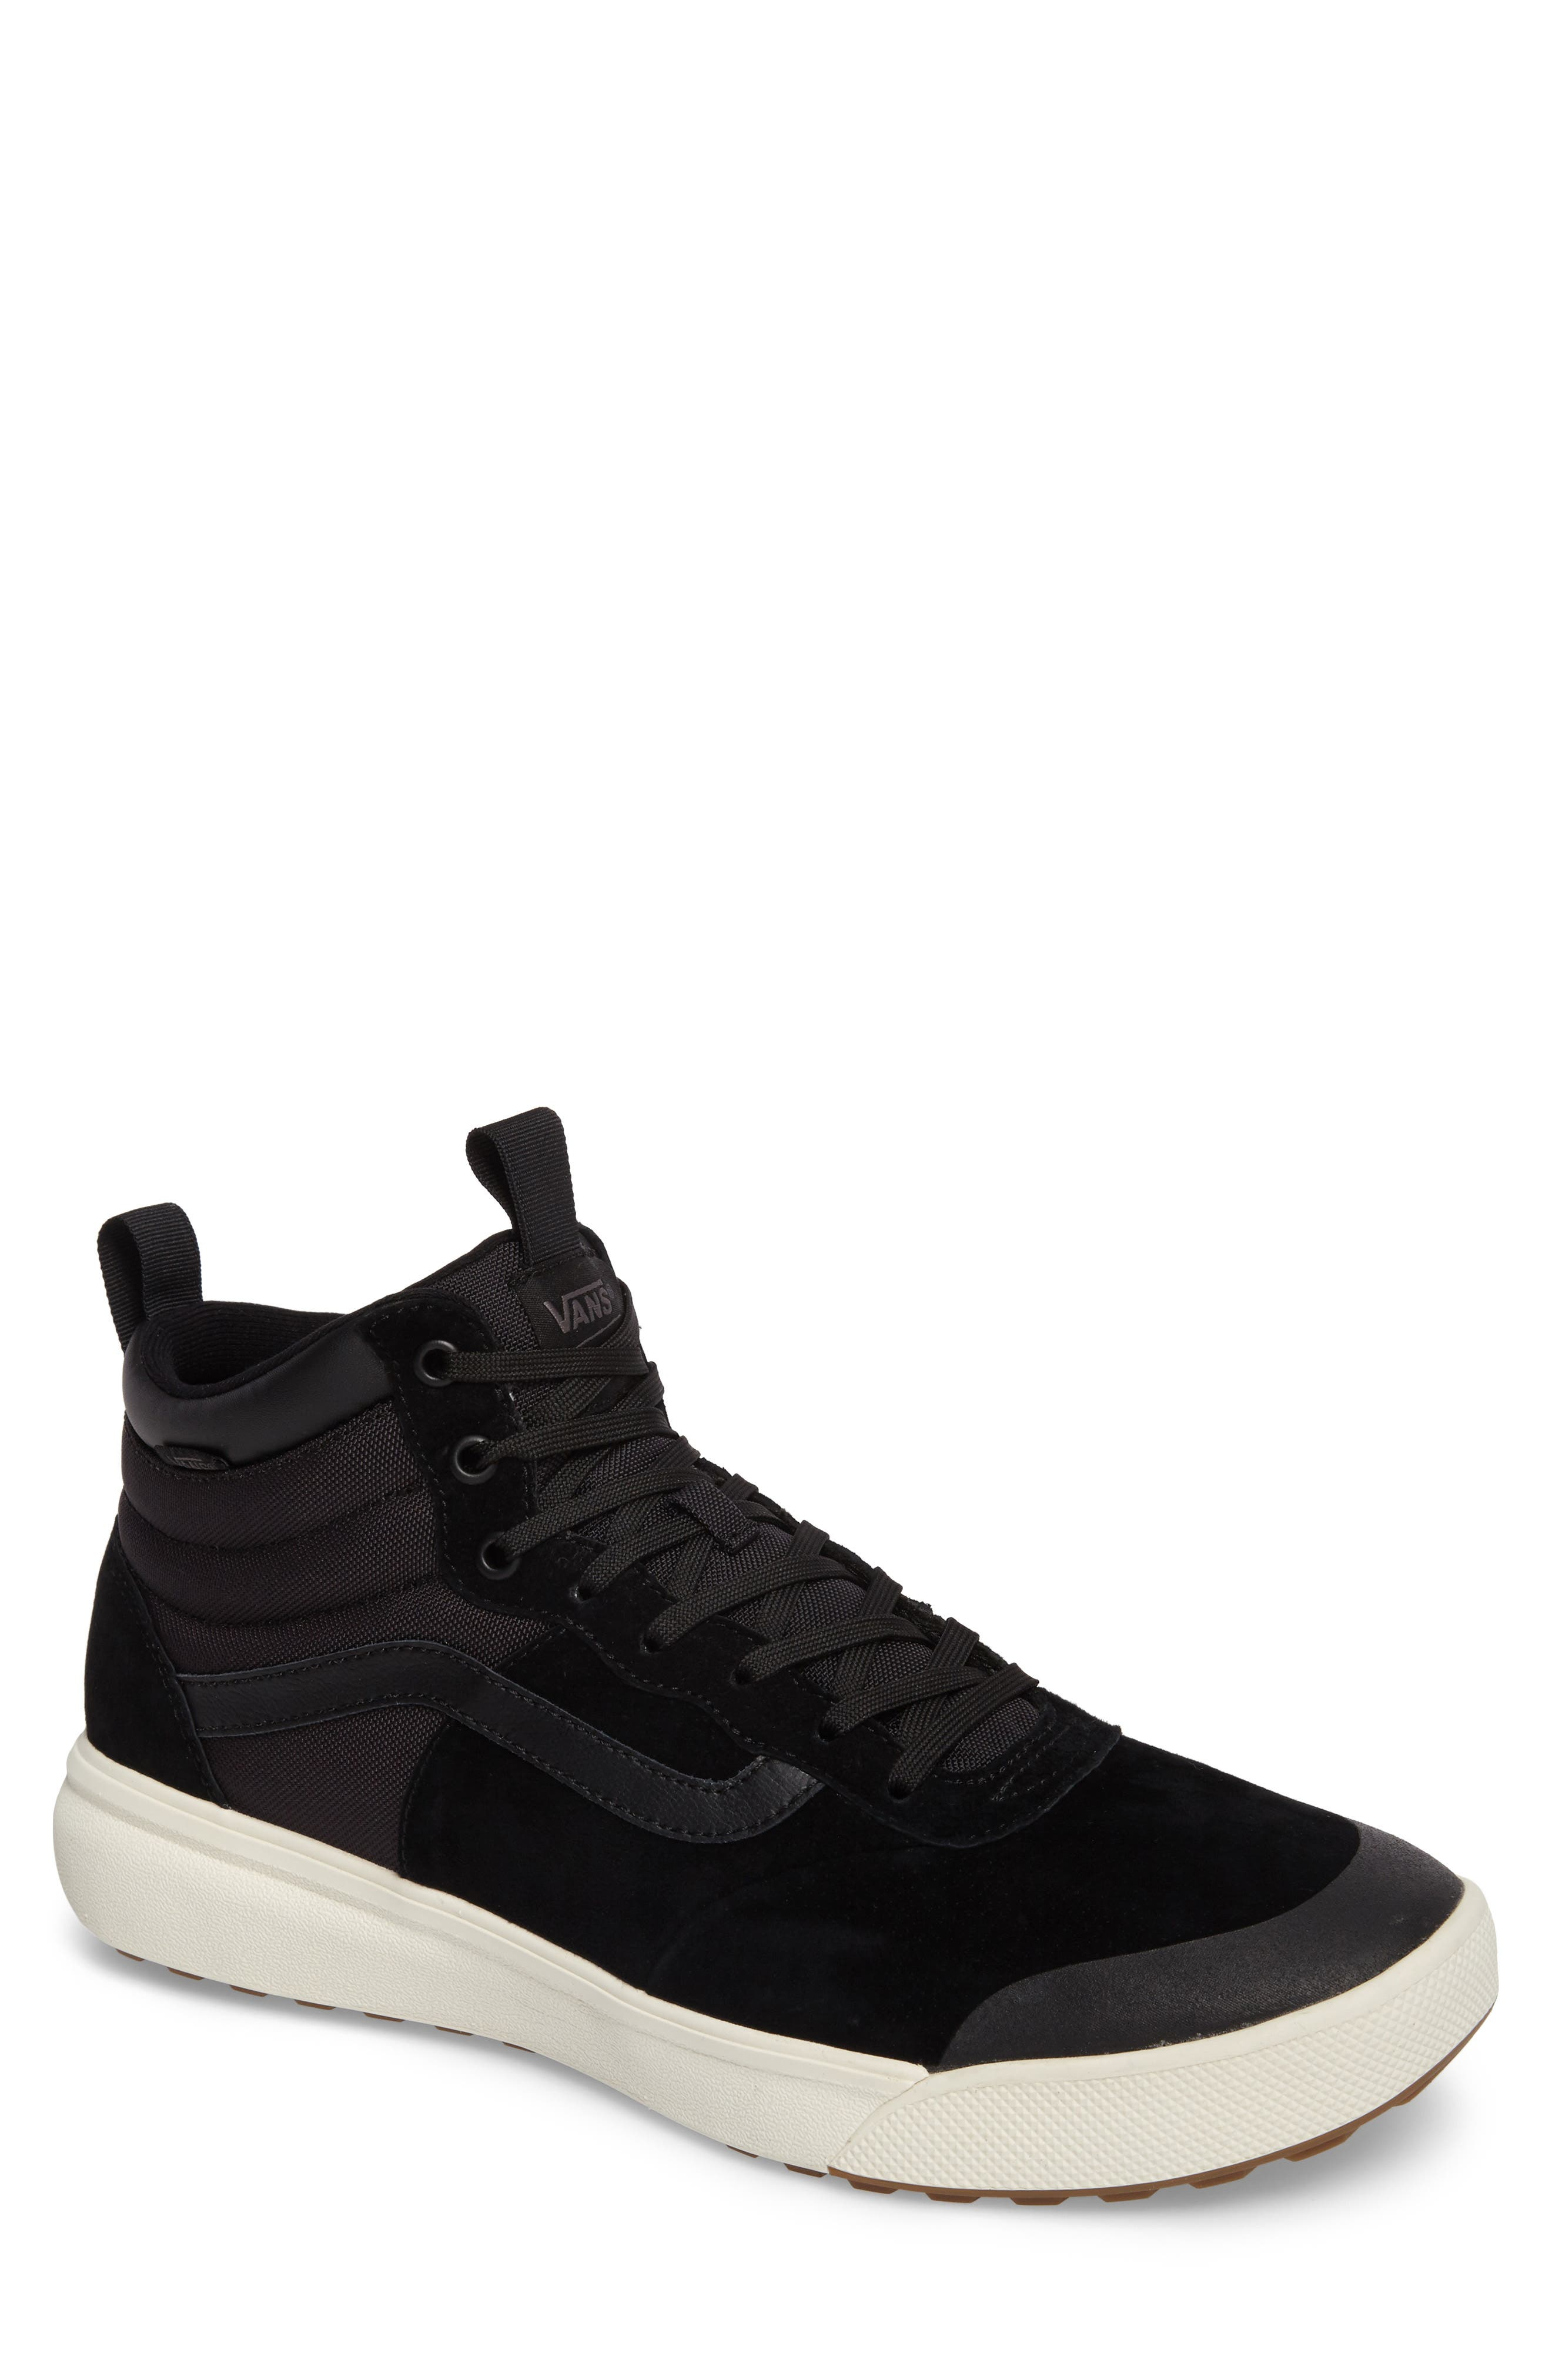 Ultrarange Hi Sneaker,                         Main,                         color, BLACK SUEDE